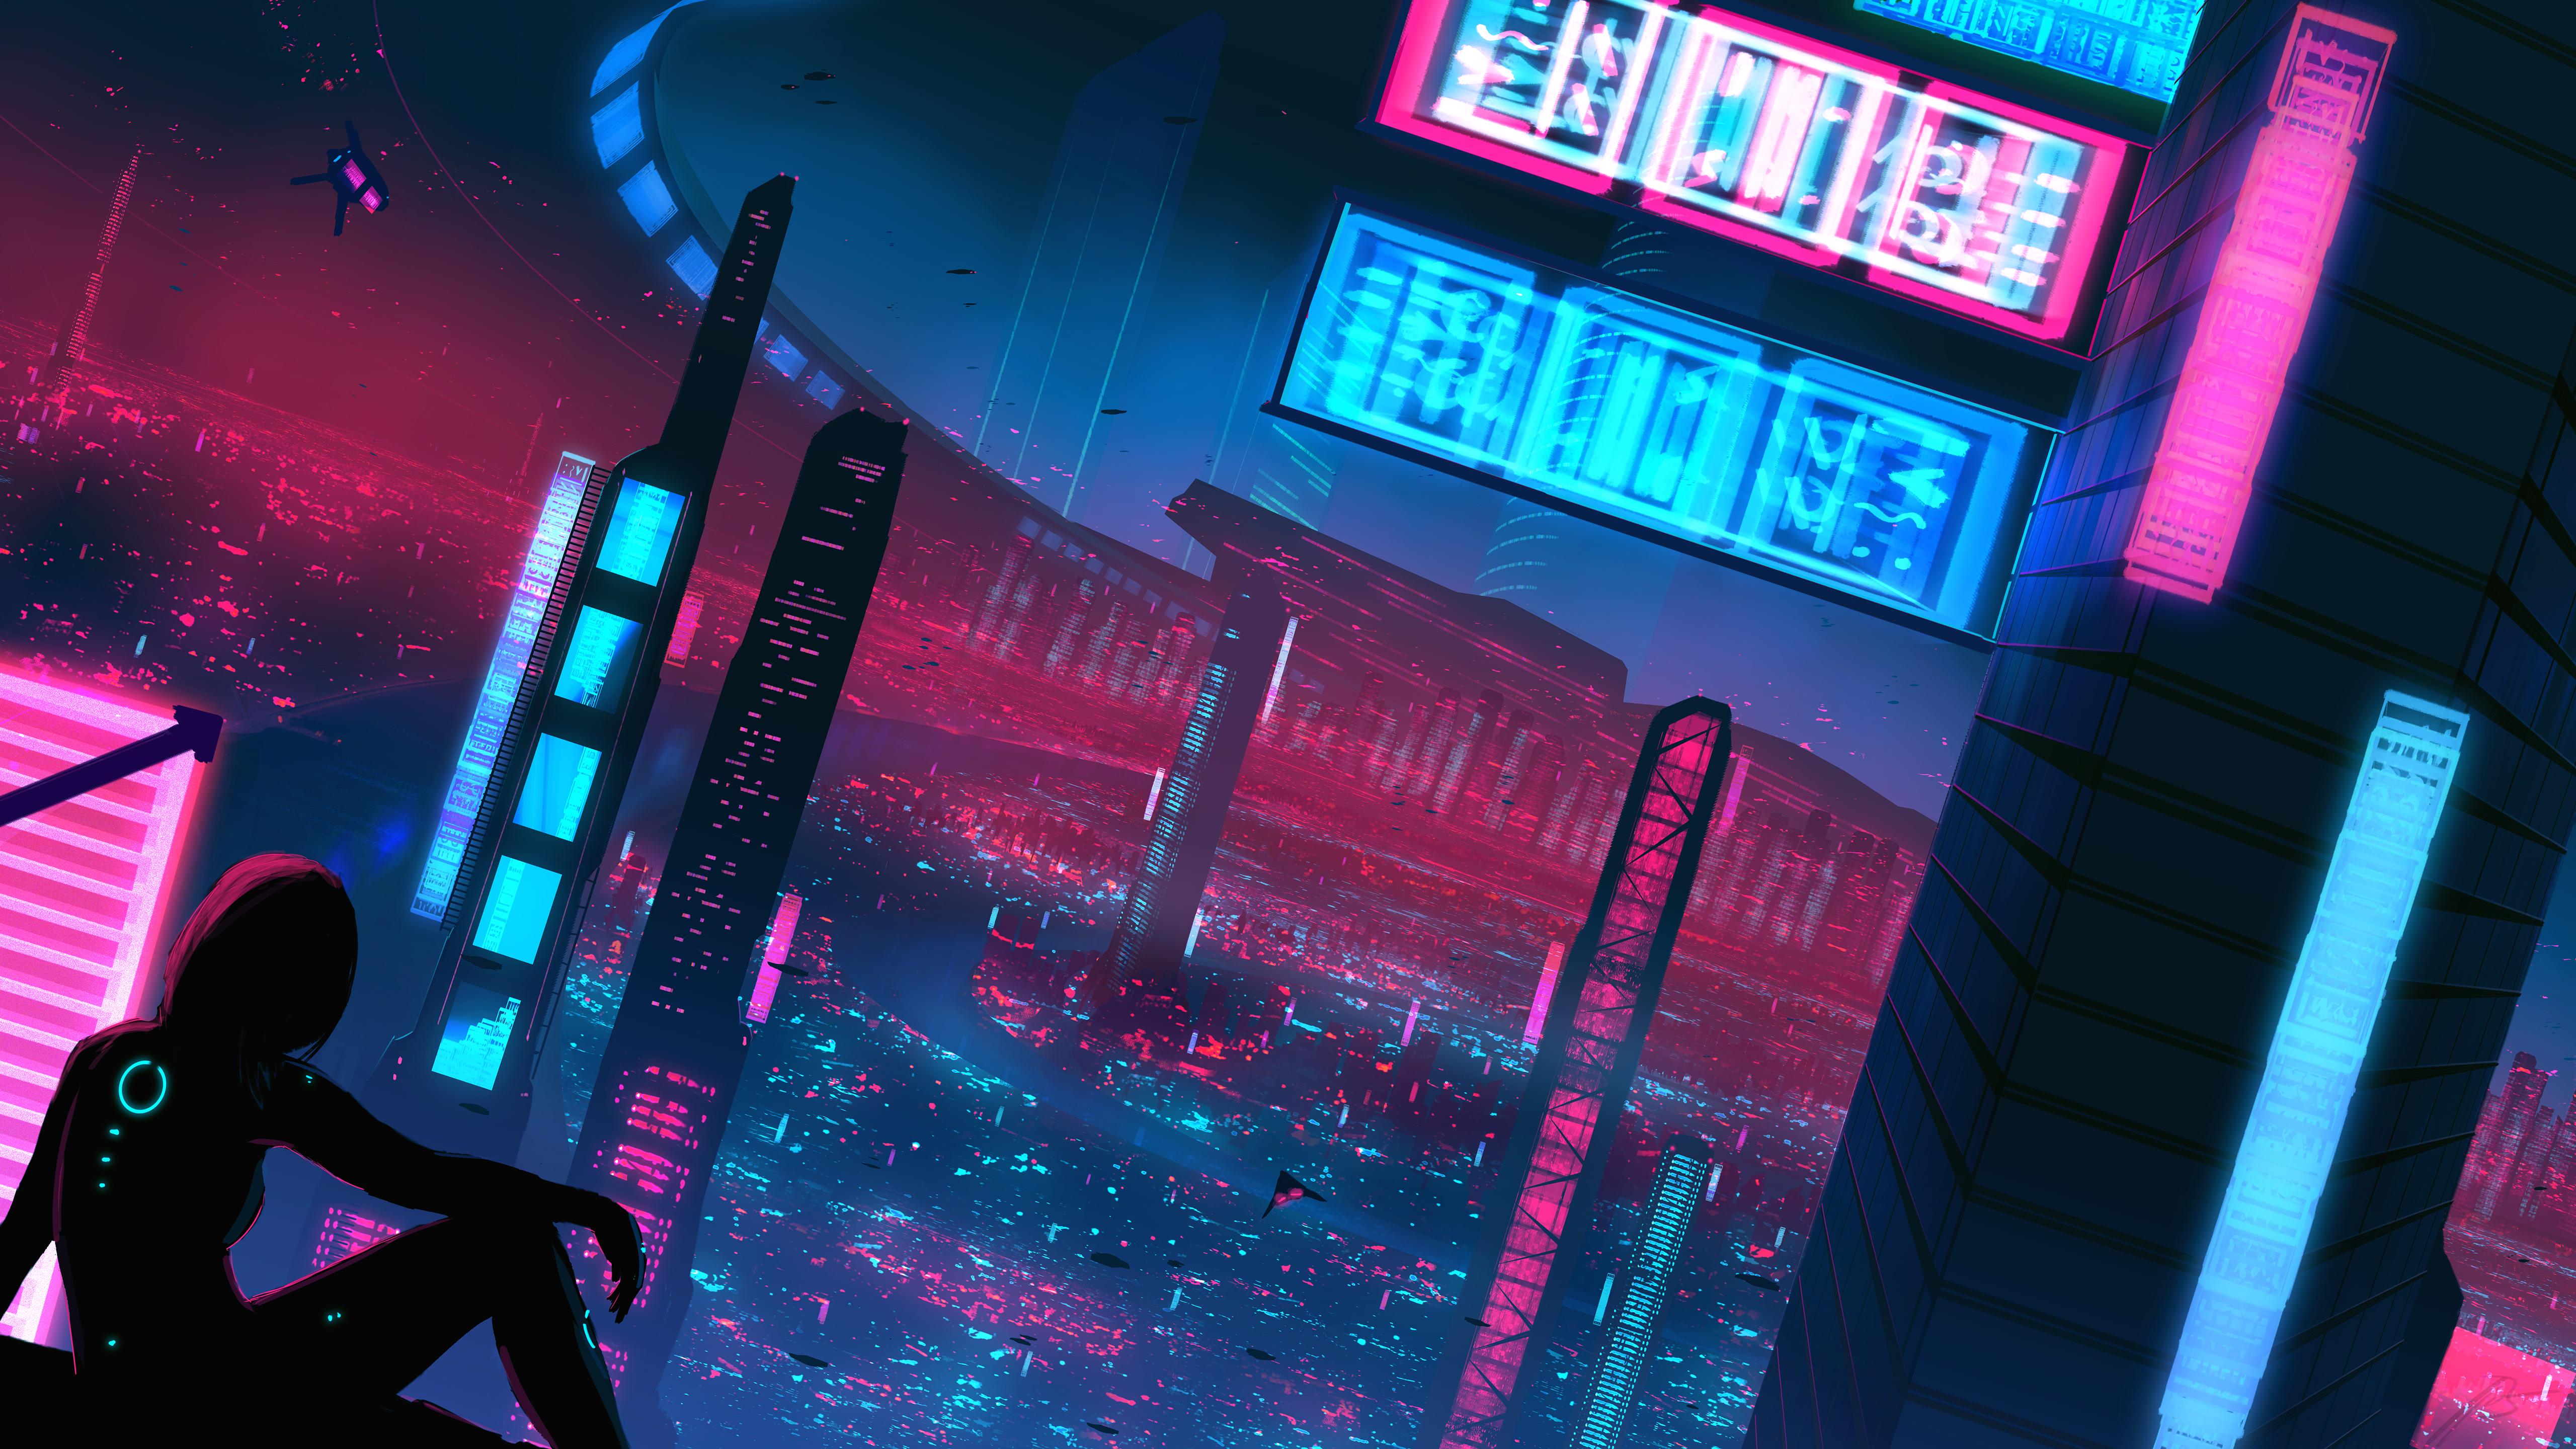 General 5120x2880 JoeyJazz neon cityscape science fiction